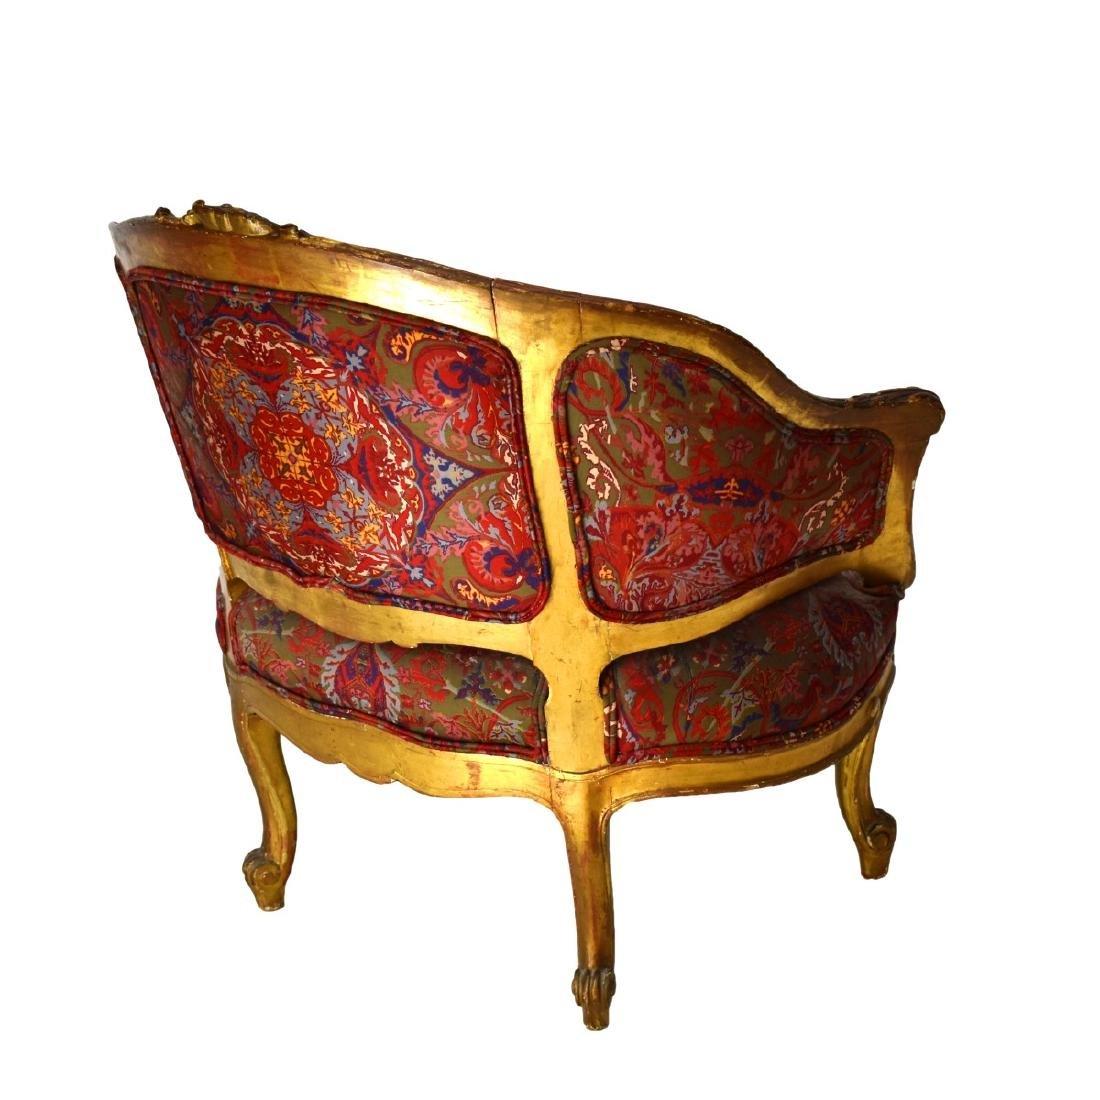 19th Century Louis XVI Style Bergere Chair - 2